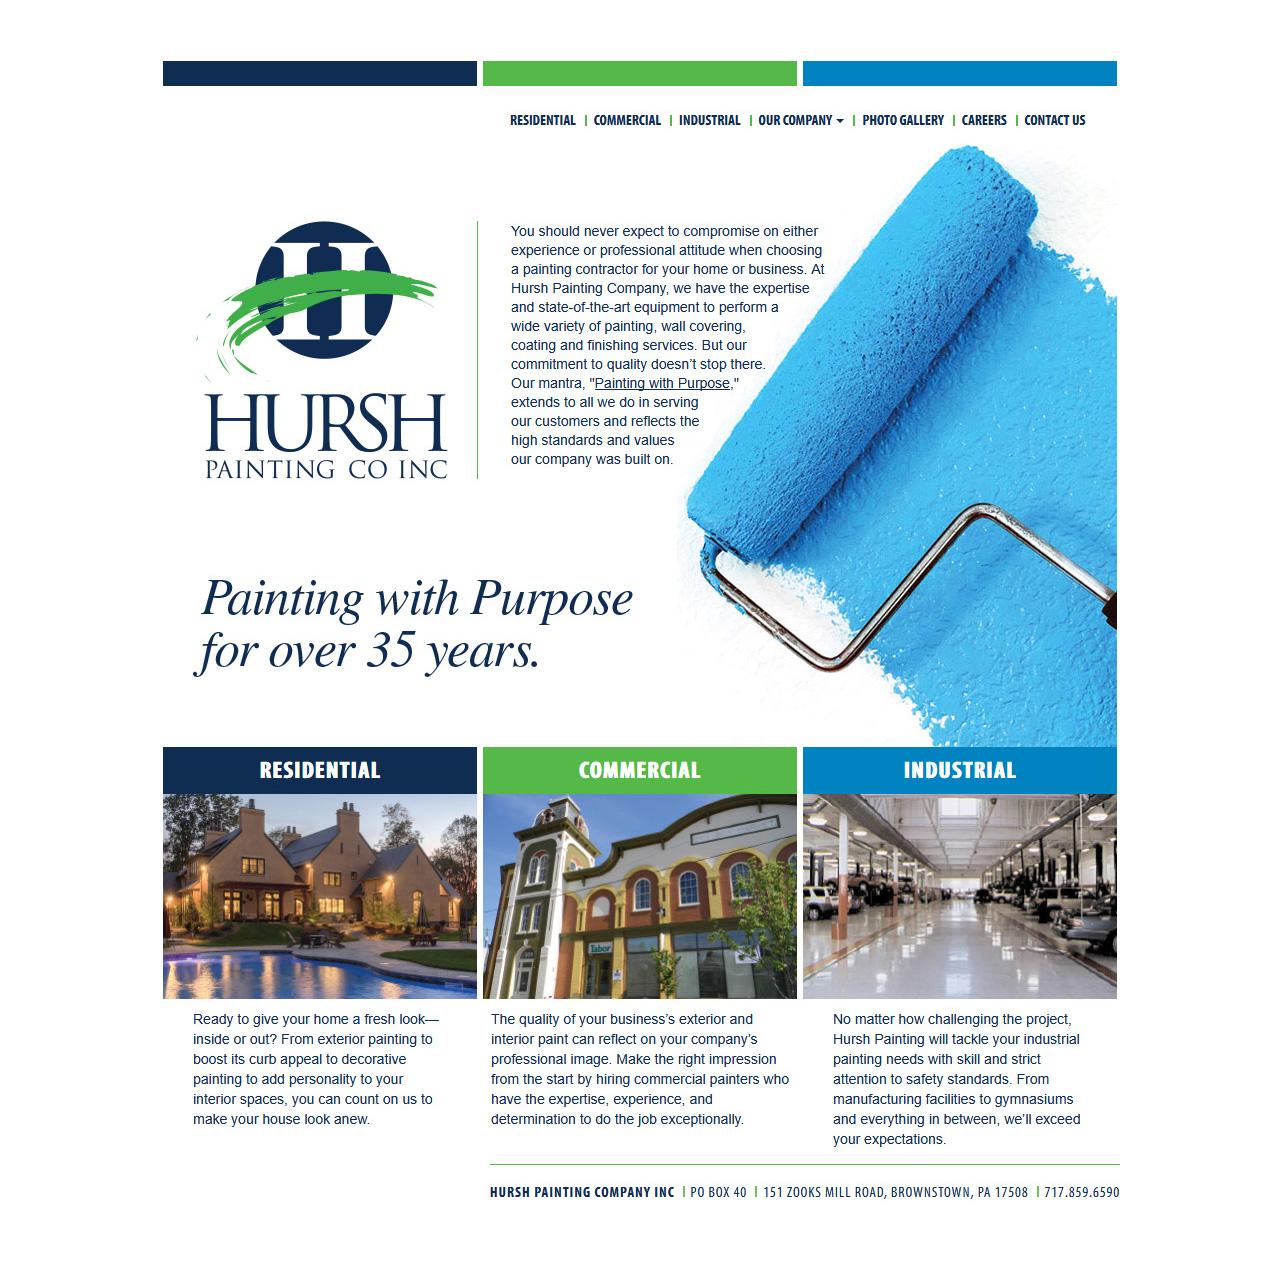 Hursh Painting Company - painting company website design